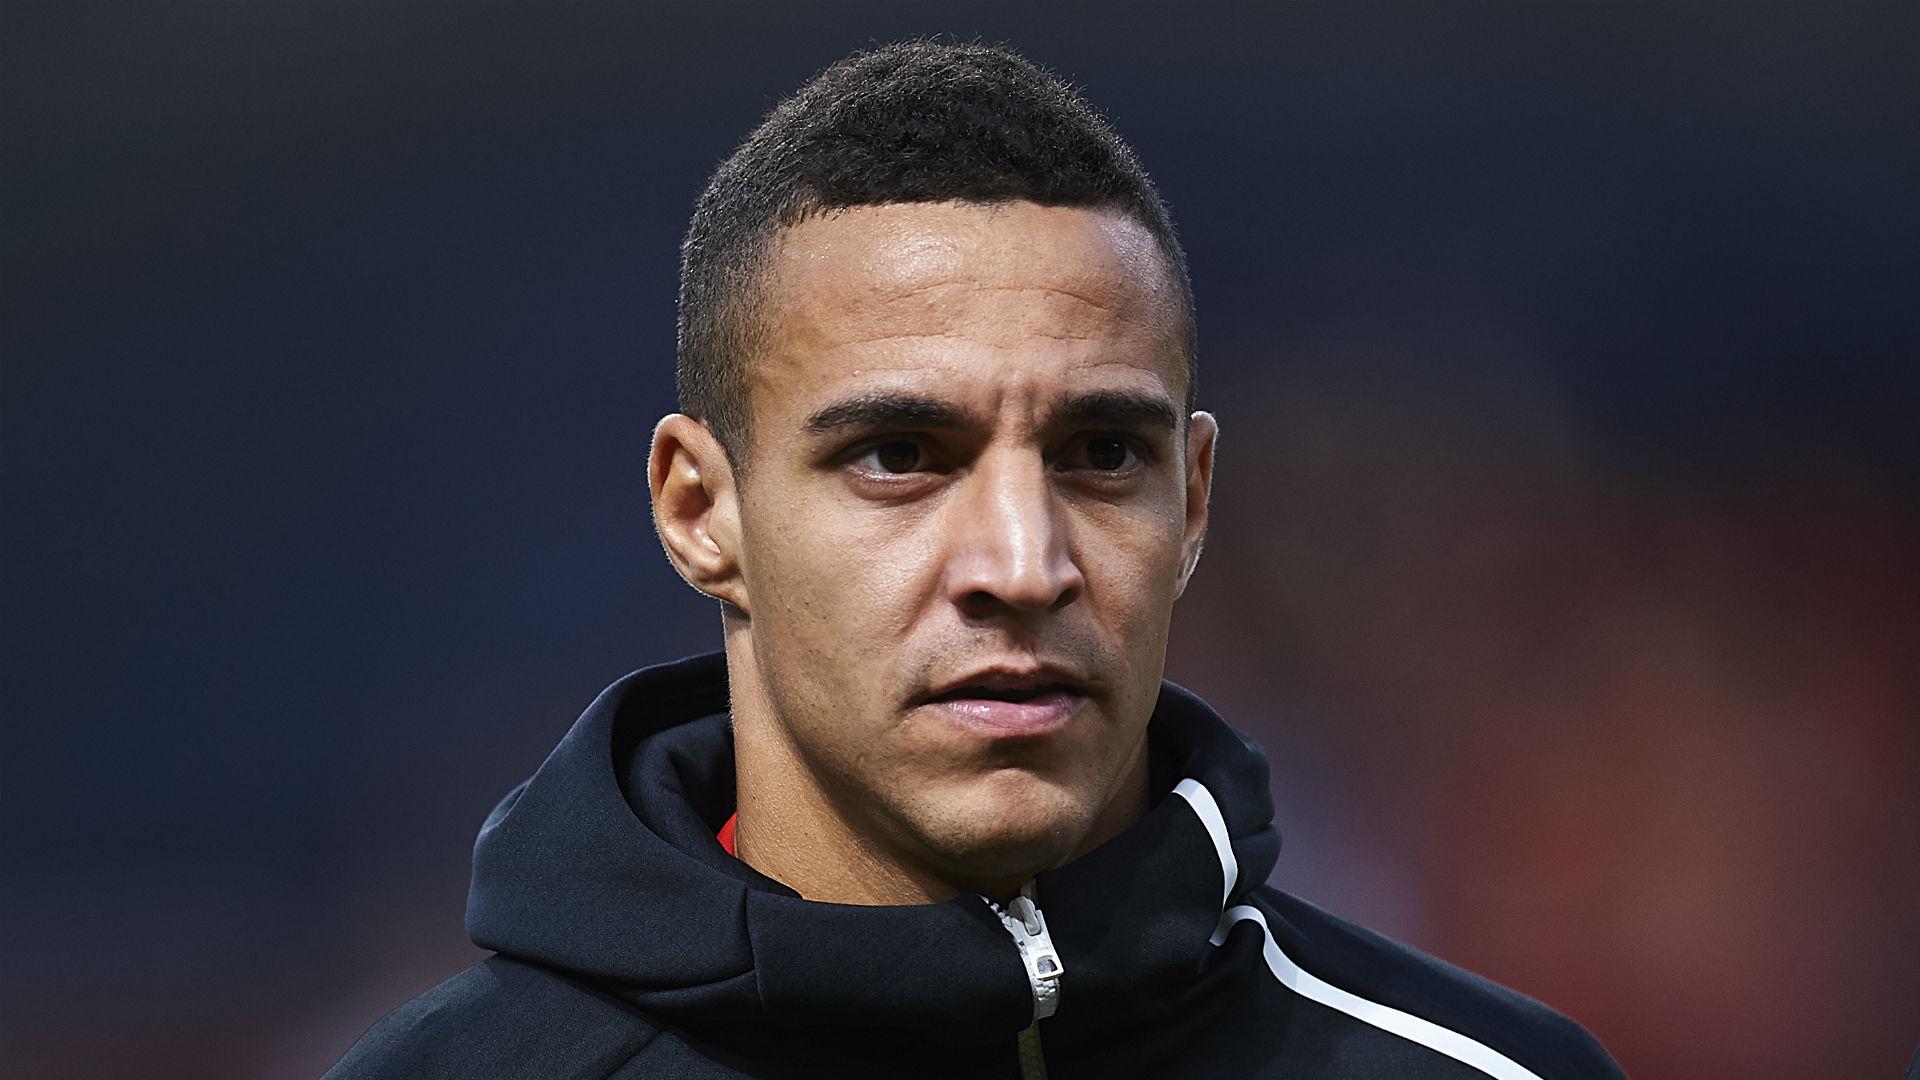 Rodrigo shrugged off fitness woe to be Spain's Euro hero